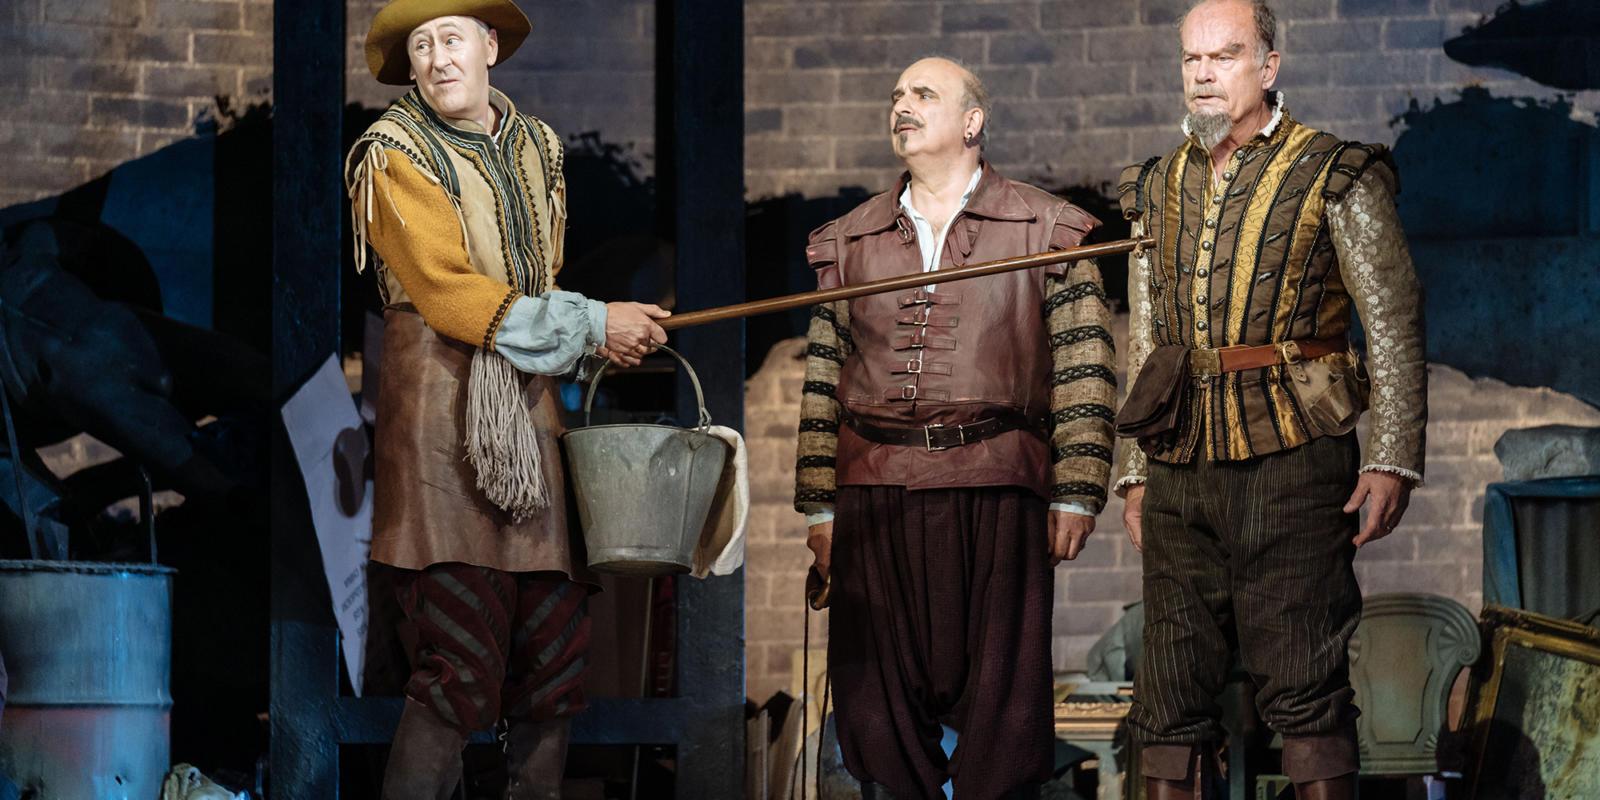 Man of La Mancha: Nicholas Lyndhurst, Peter Polycarpou and Kelsey Grammer